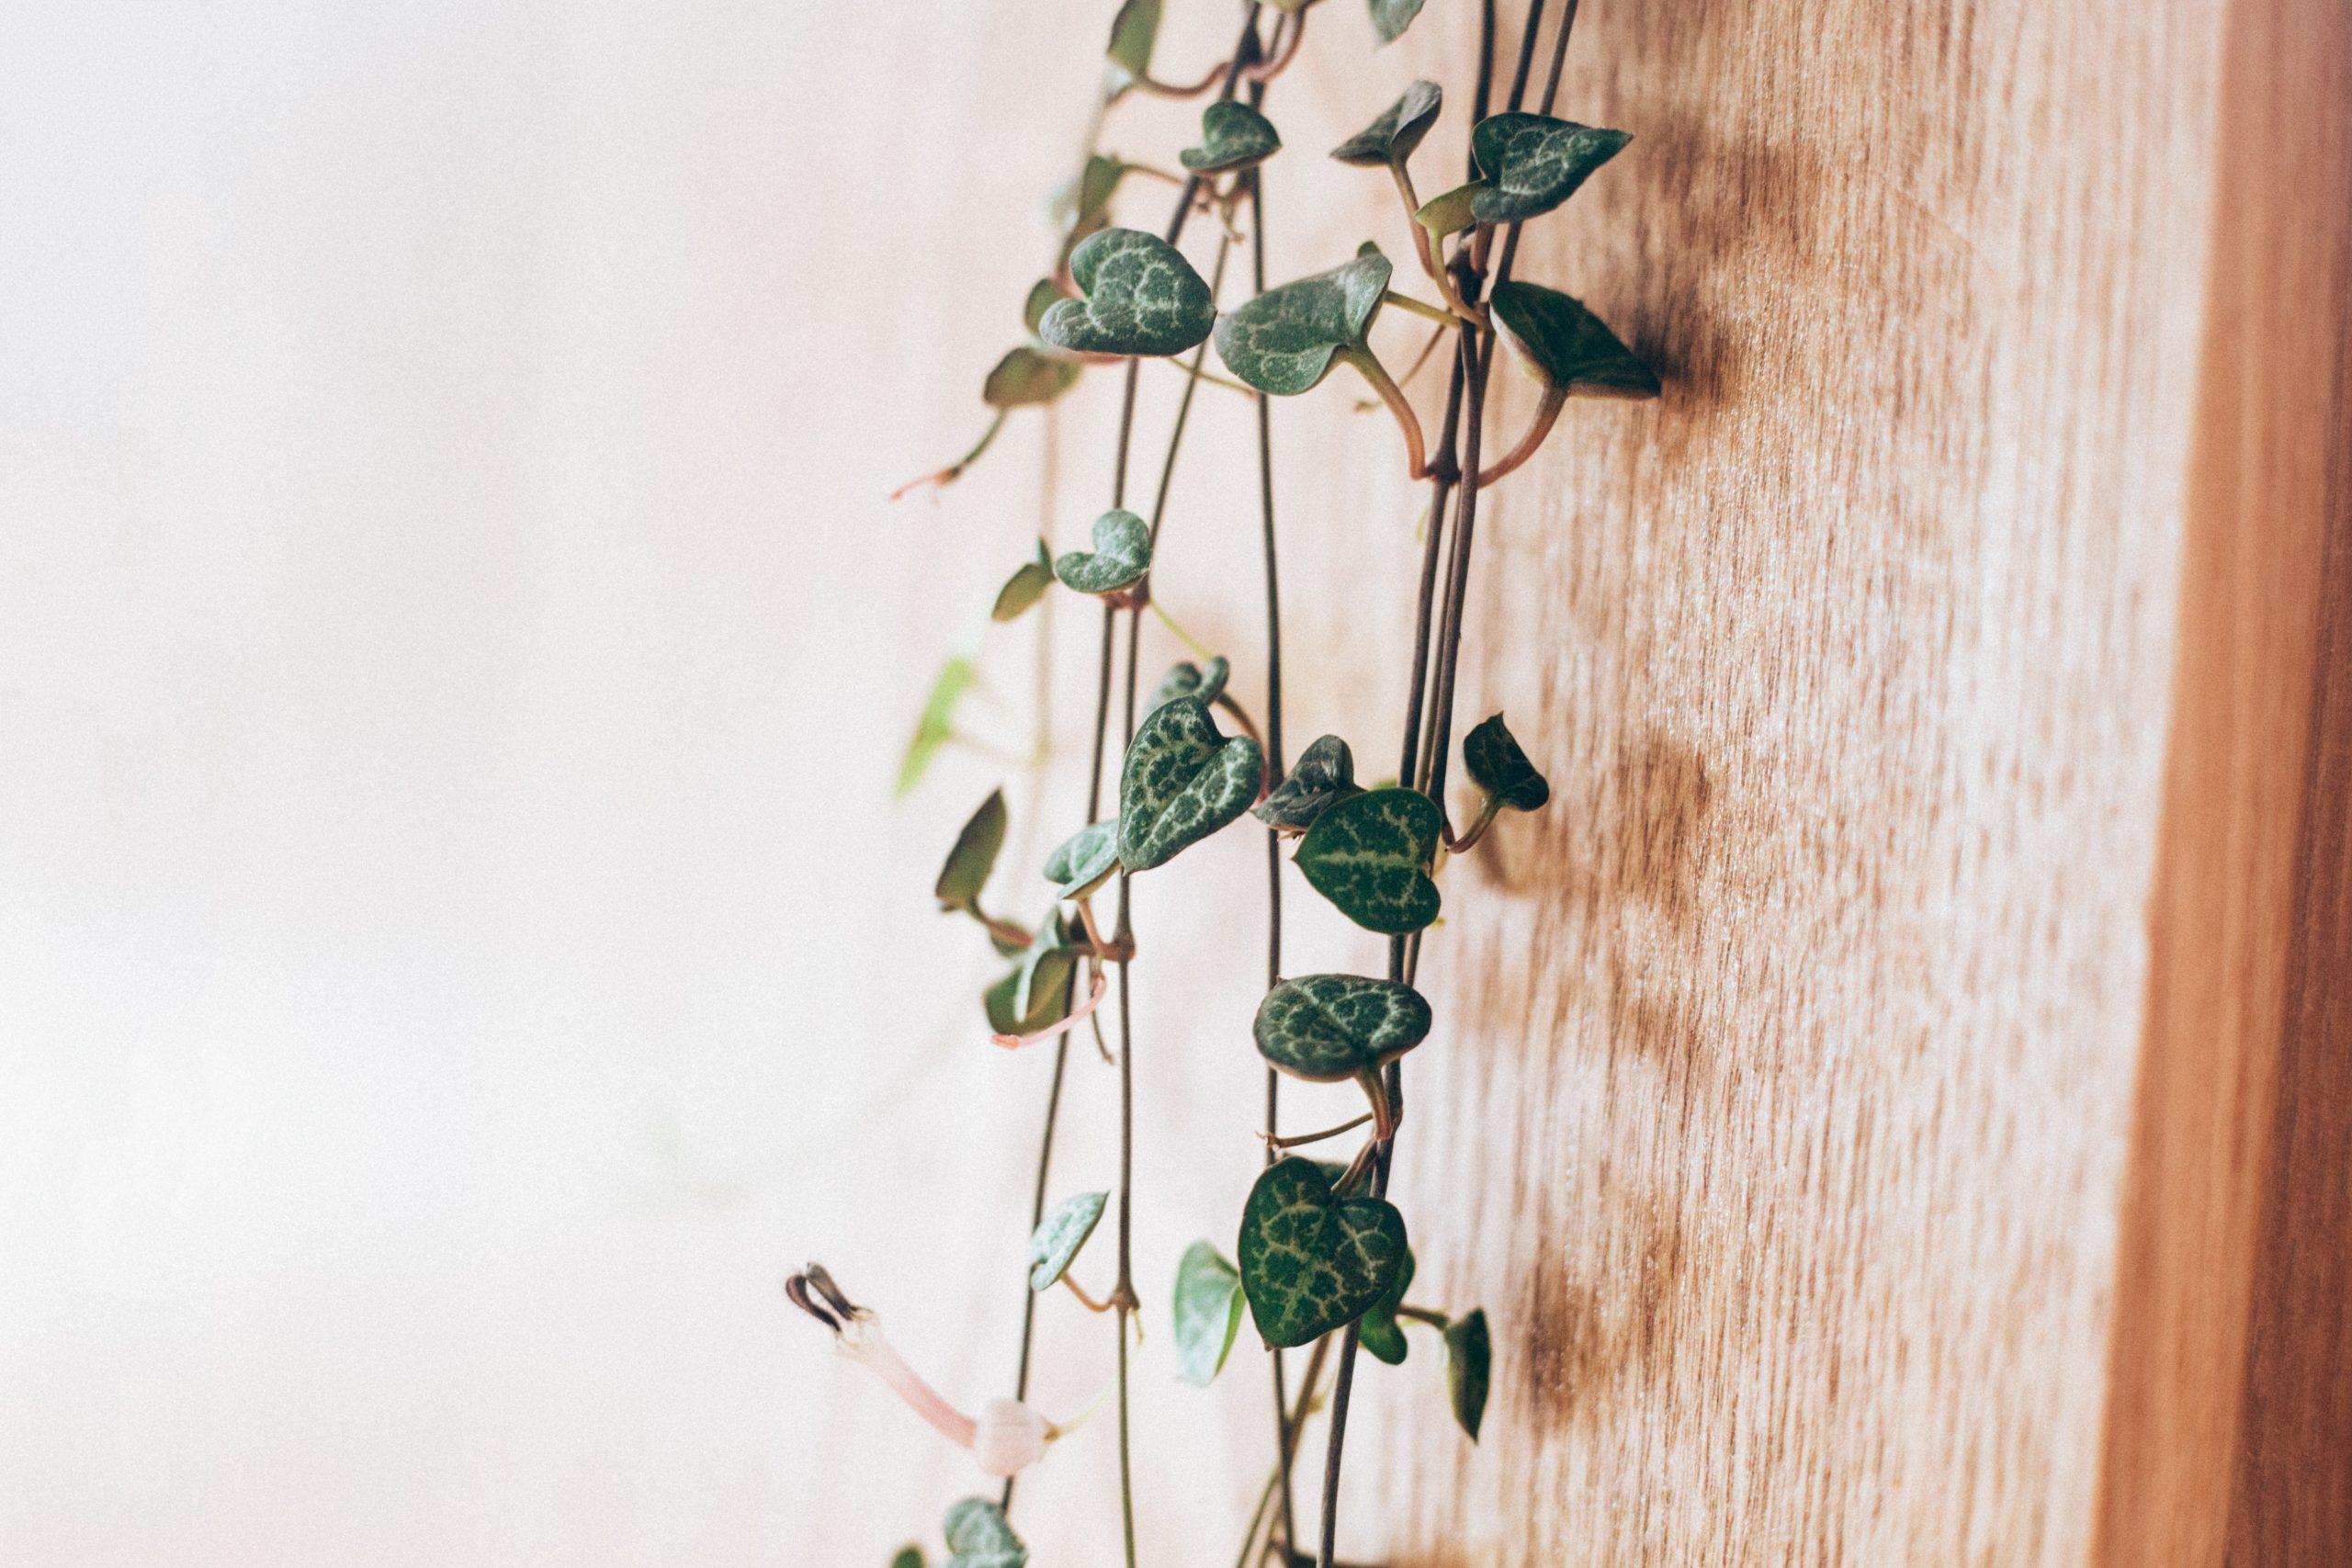 chinees lantaarntplantje